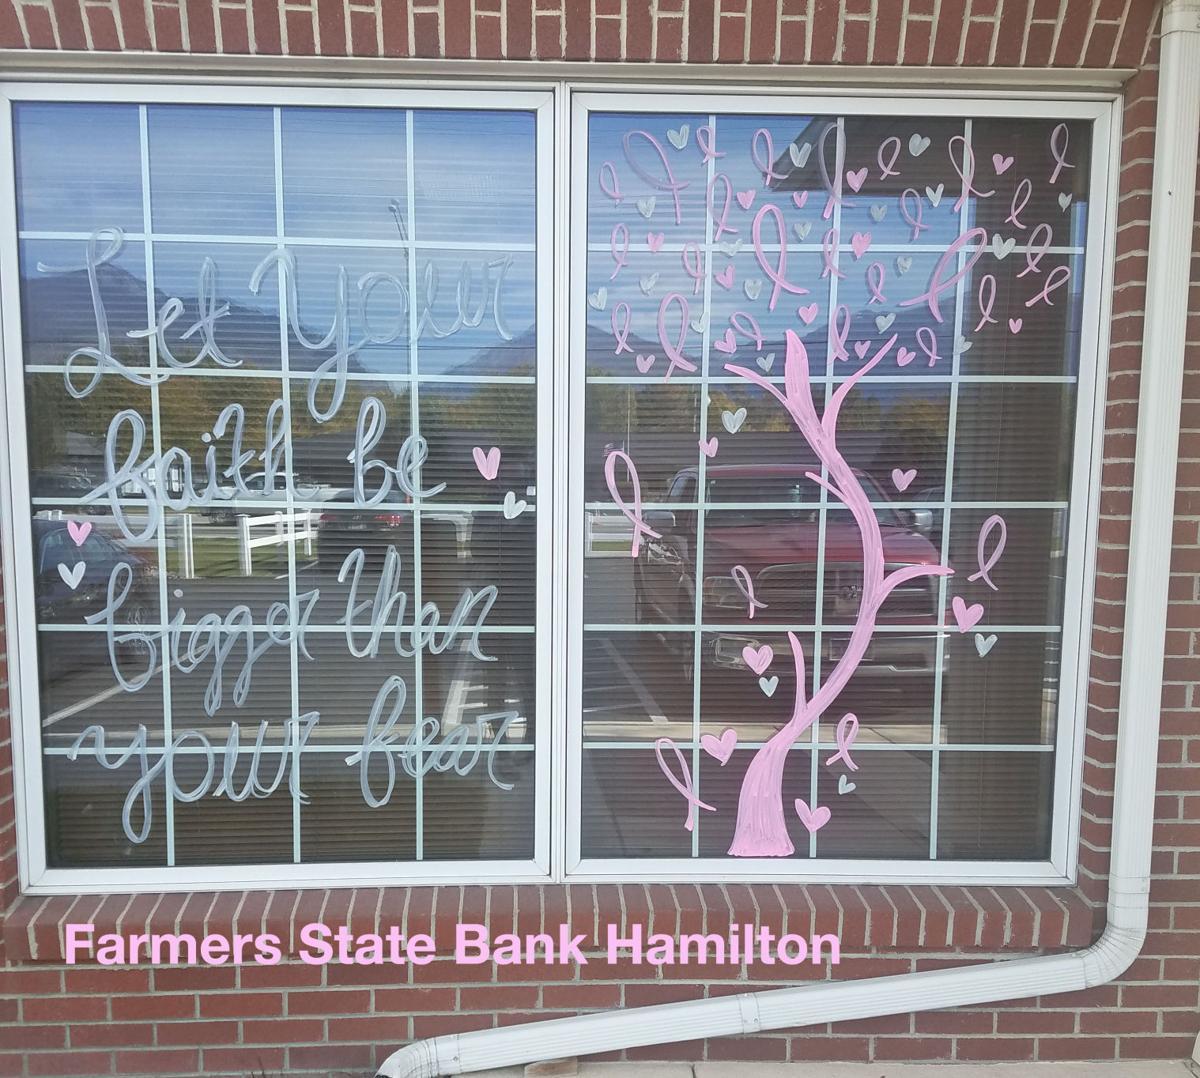 Farmers State Bank Hamilton